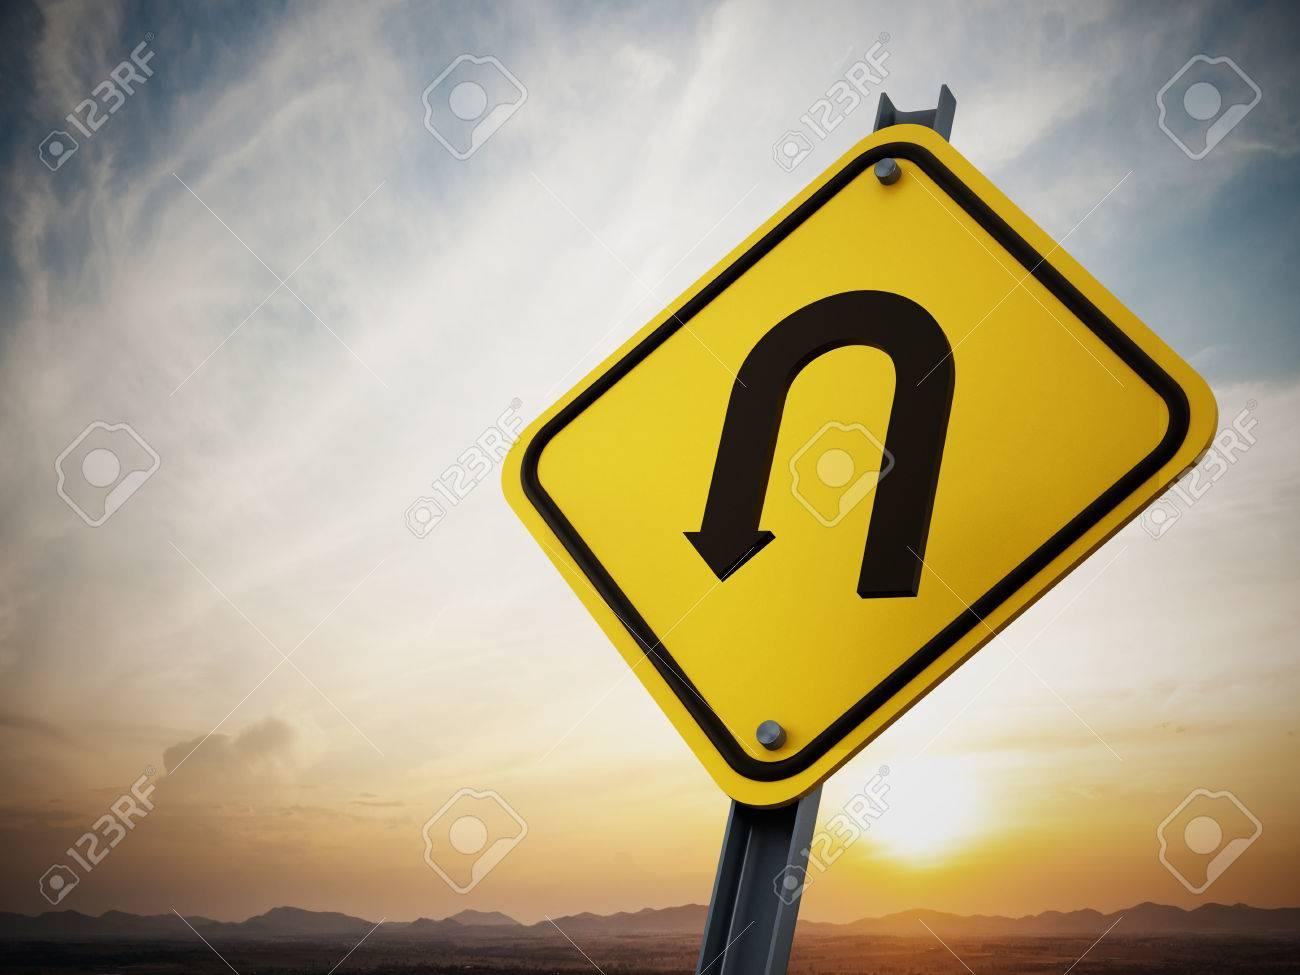 U turn road sign on setting sun background Stock Photo - 35371860